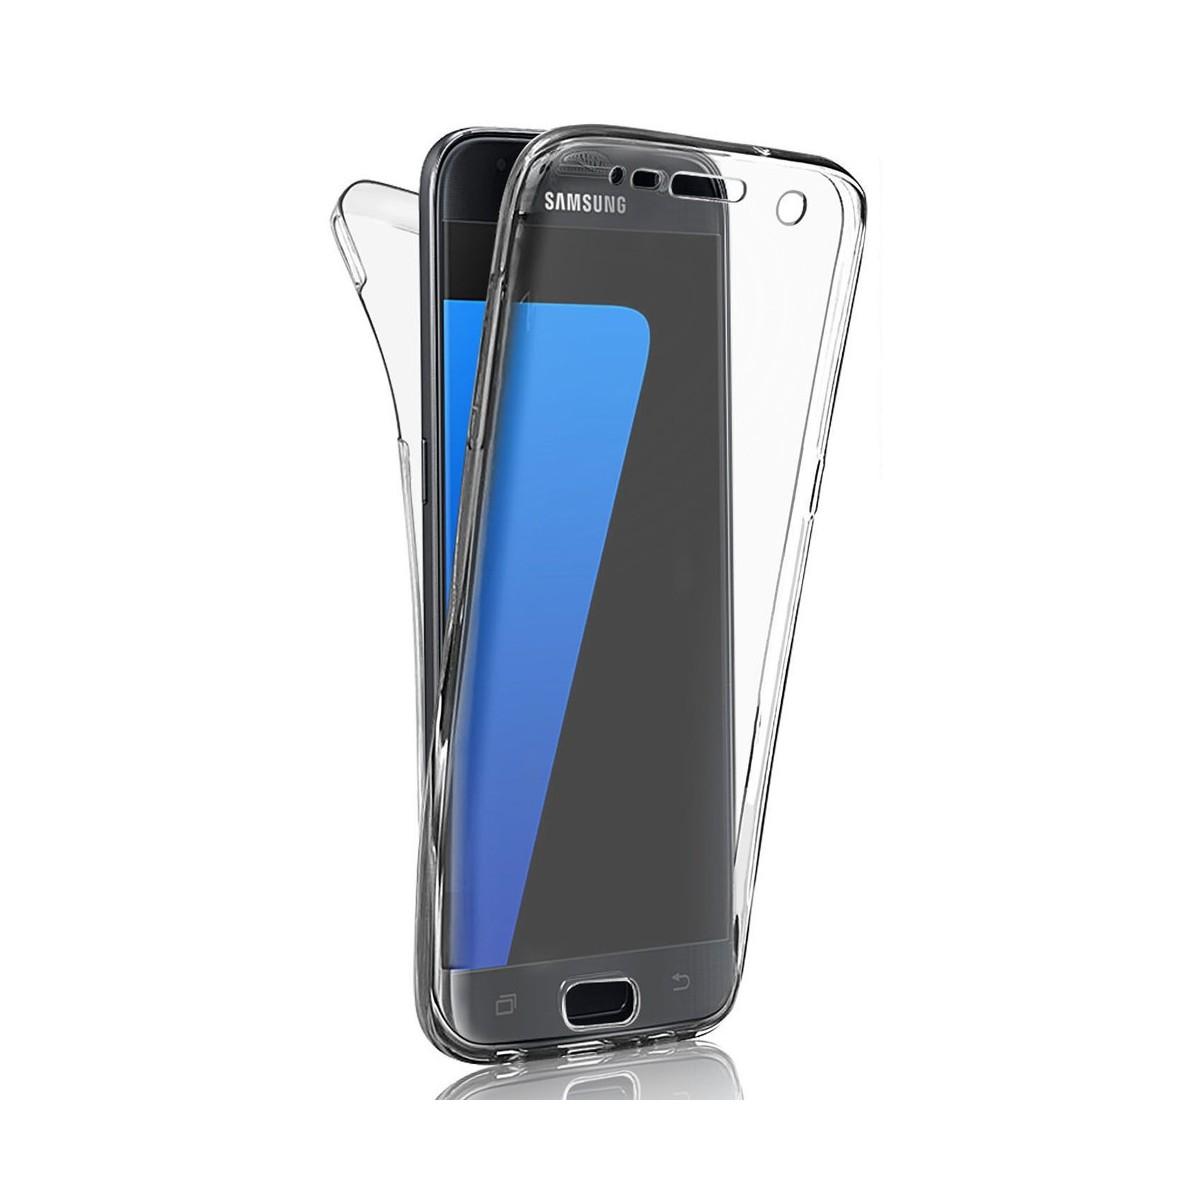 Coque Galaxy J5 protection 360 ° Transparente souple - Crazy Kase